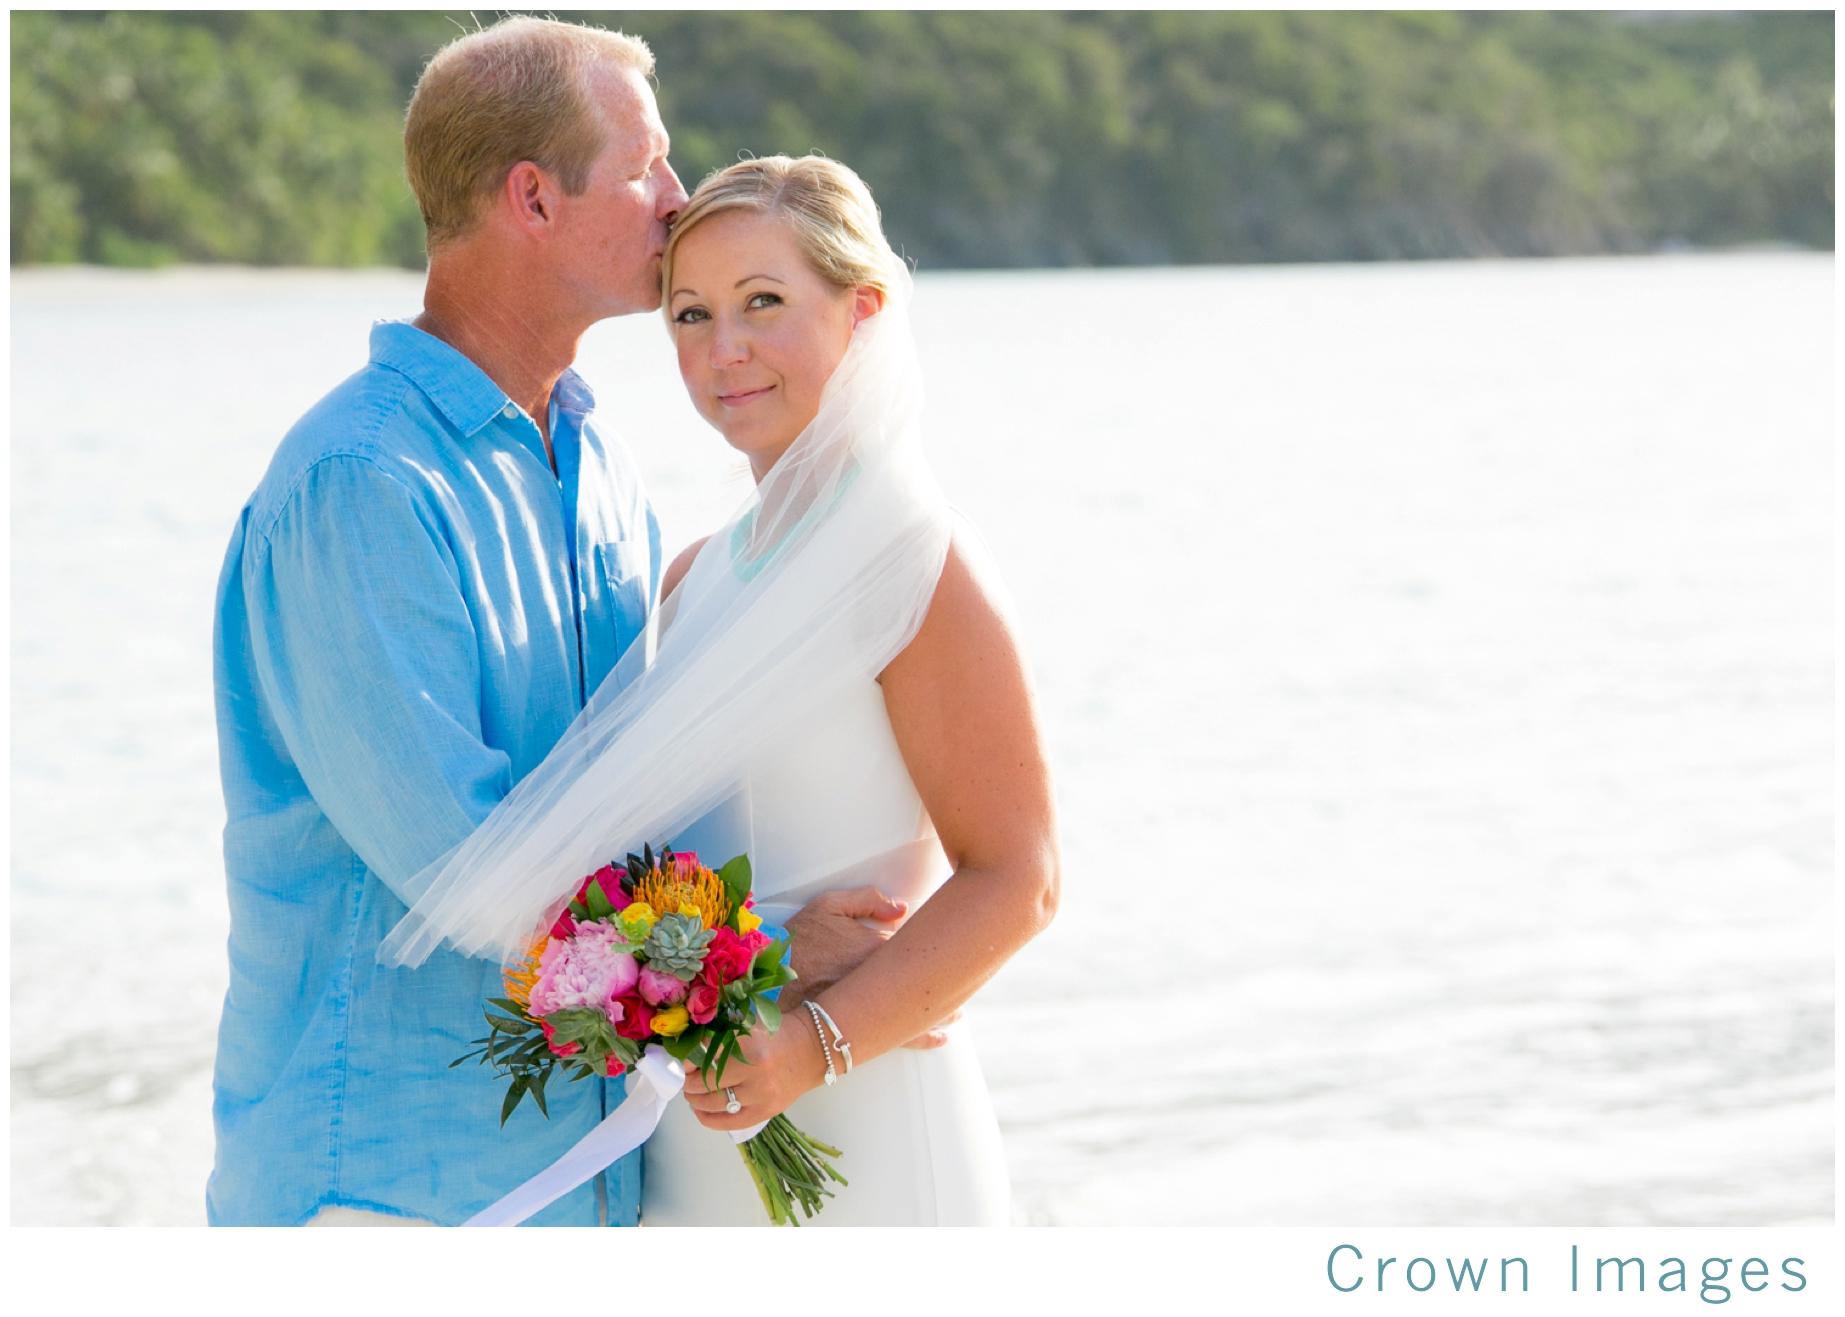 st_john_wedding_photographer_crown_images_0075.jpg